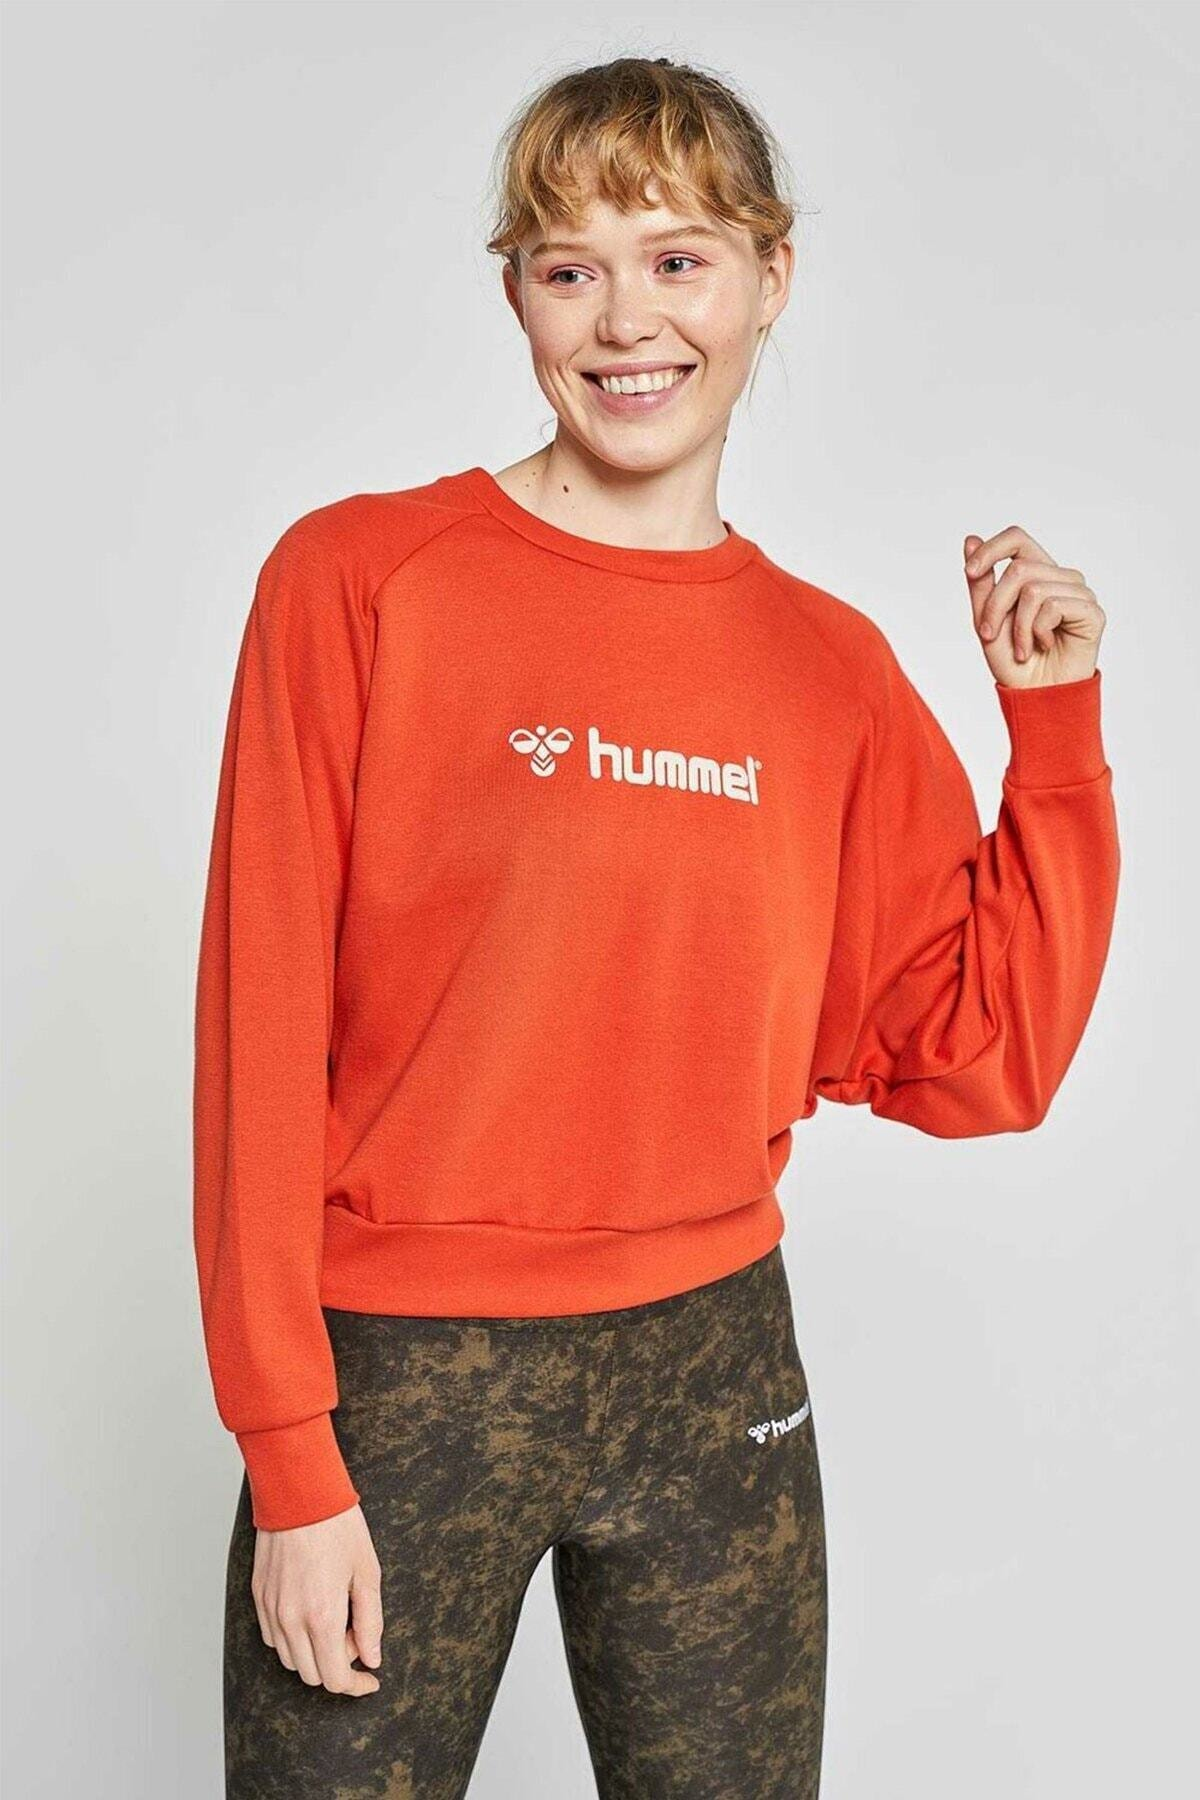 HUMMEL Kadın Stella Kırmızı Sweatshirt 921057-3840 2